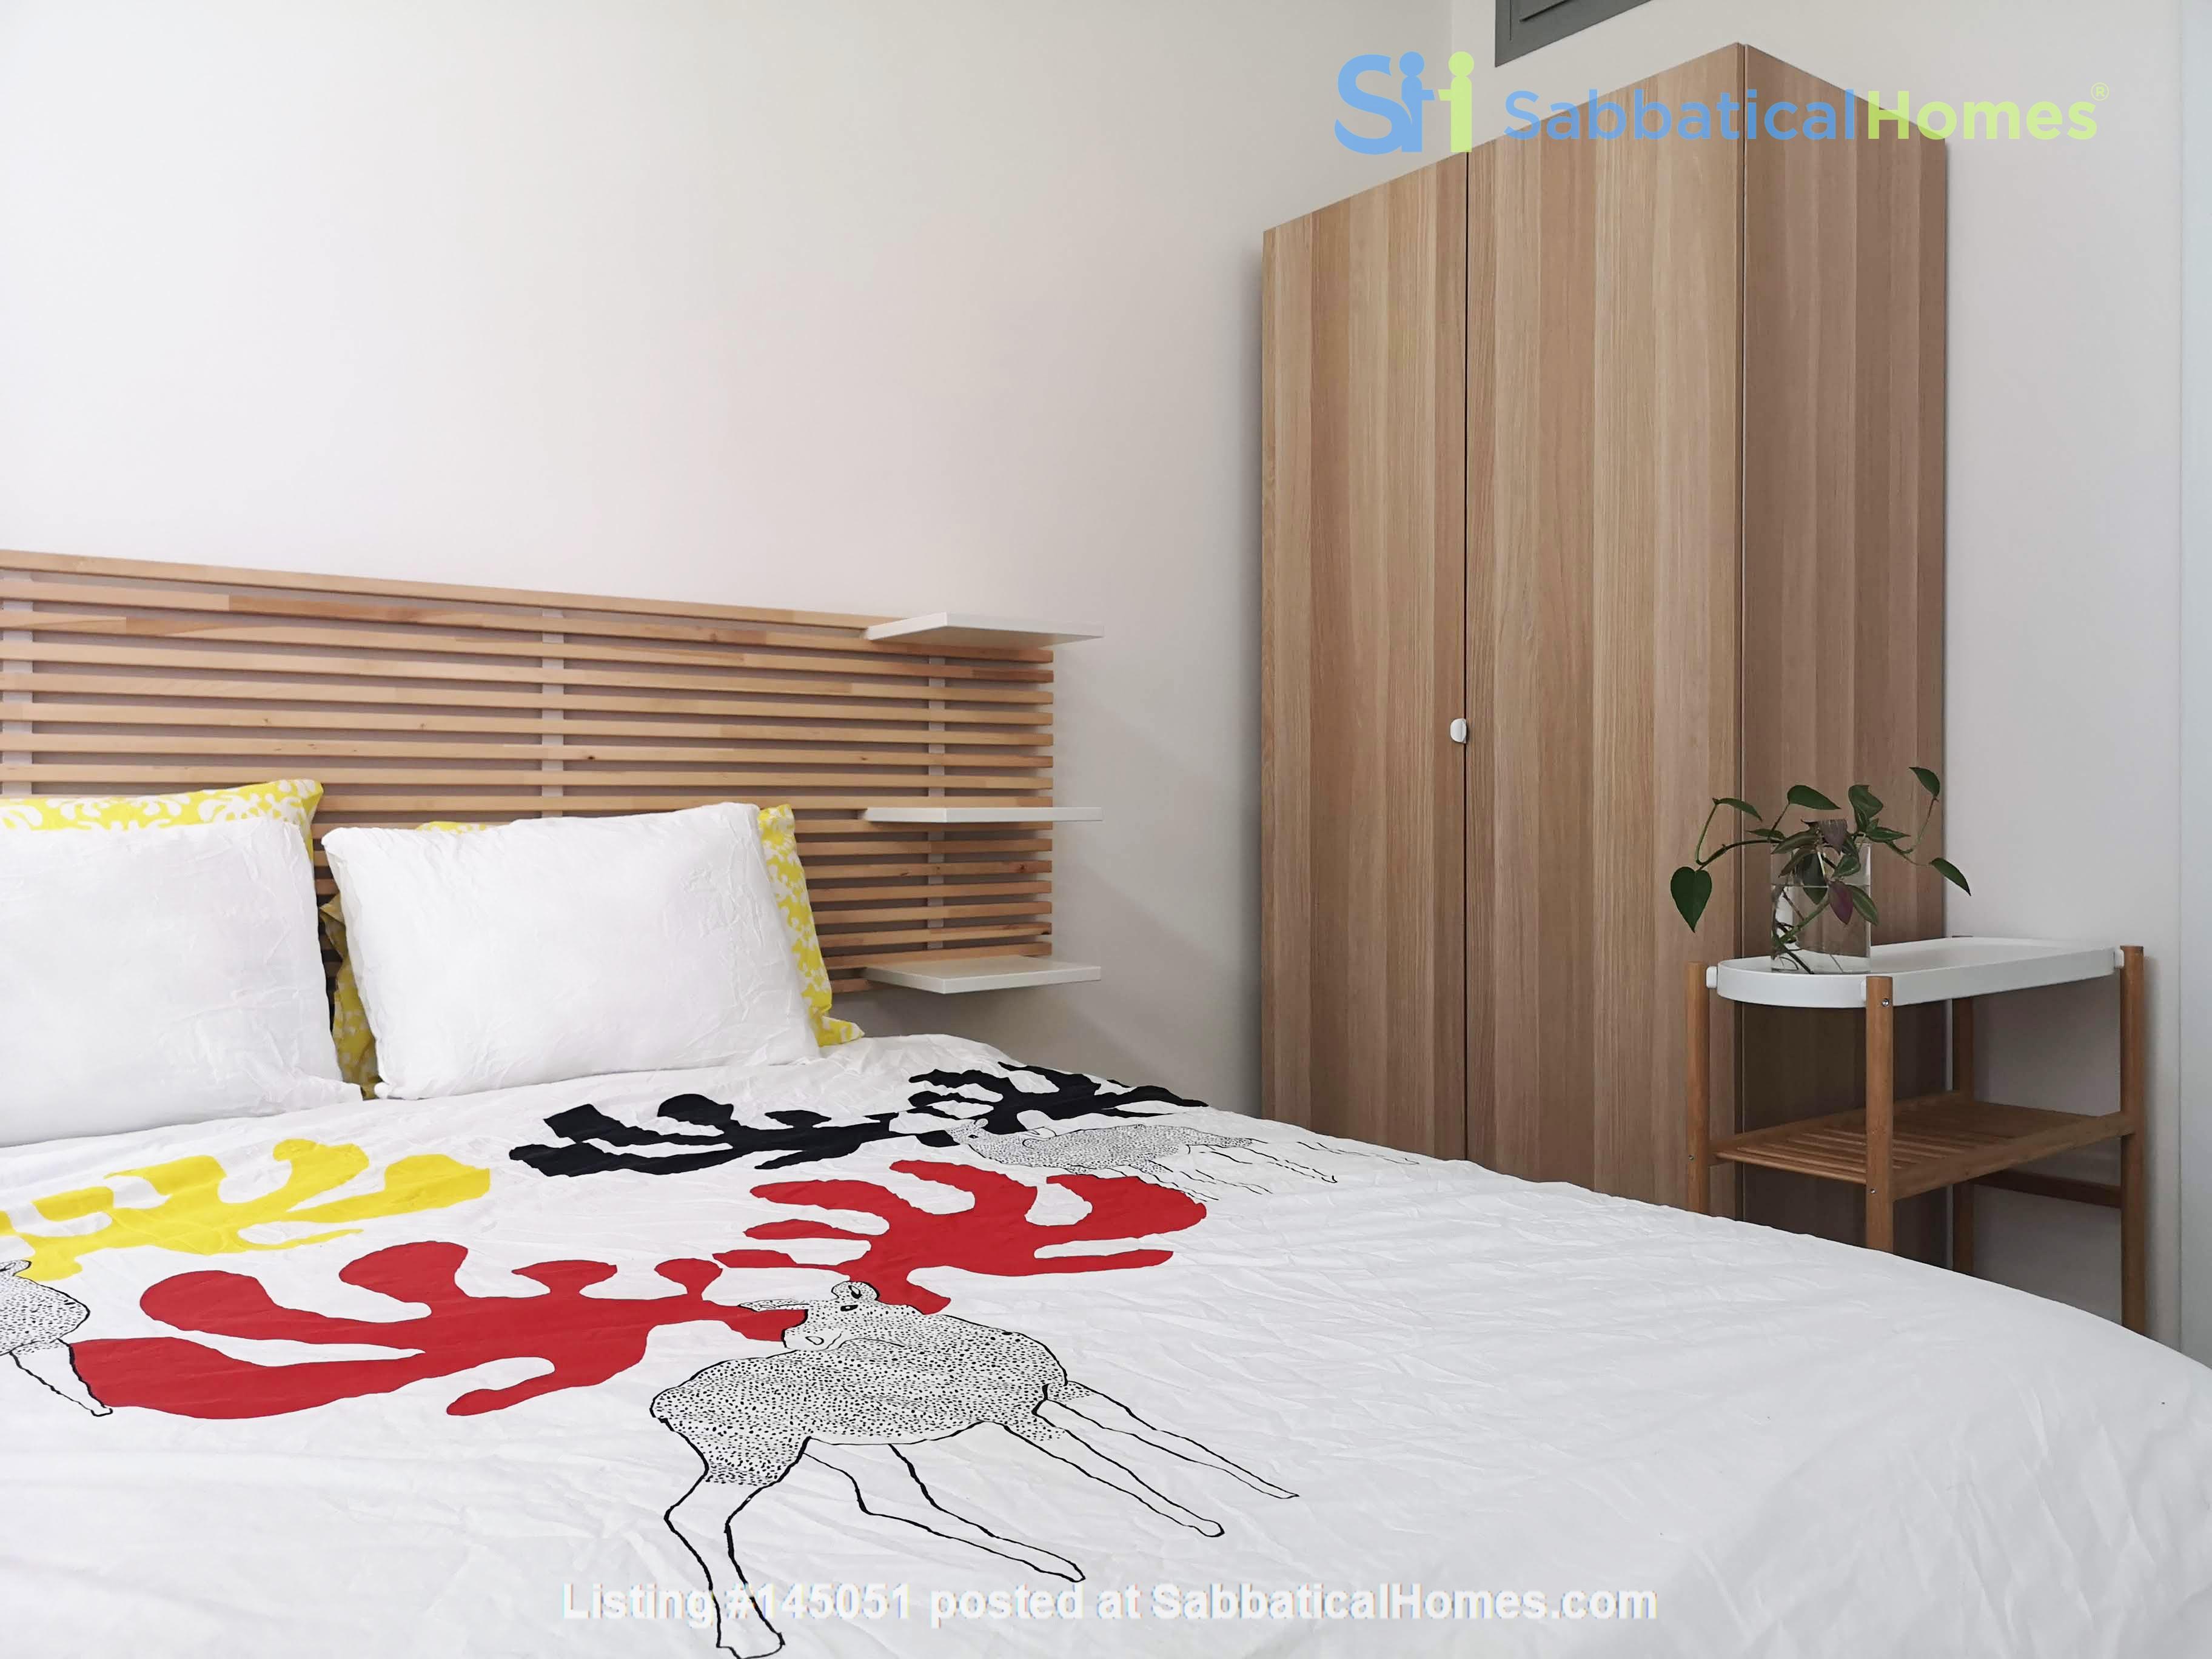 Cozy design apartment in historic neighborhood Home Rental in Nicosia, Nicosia, Cyprus 6